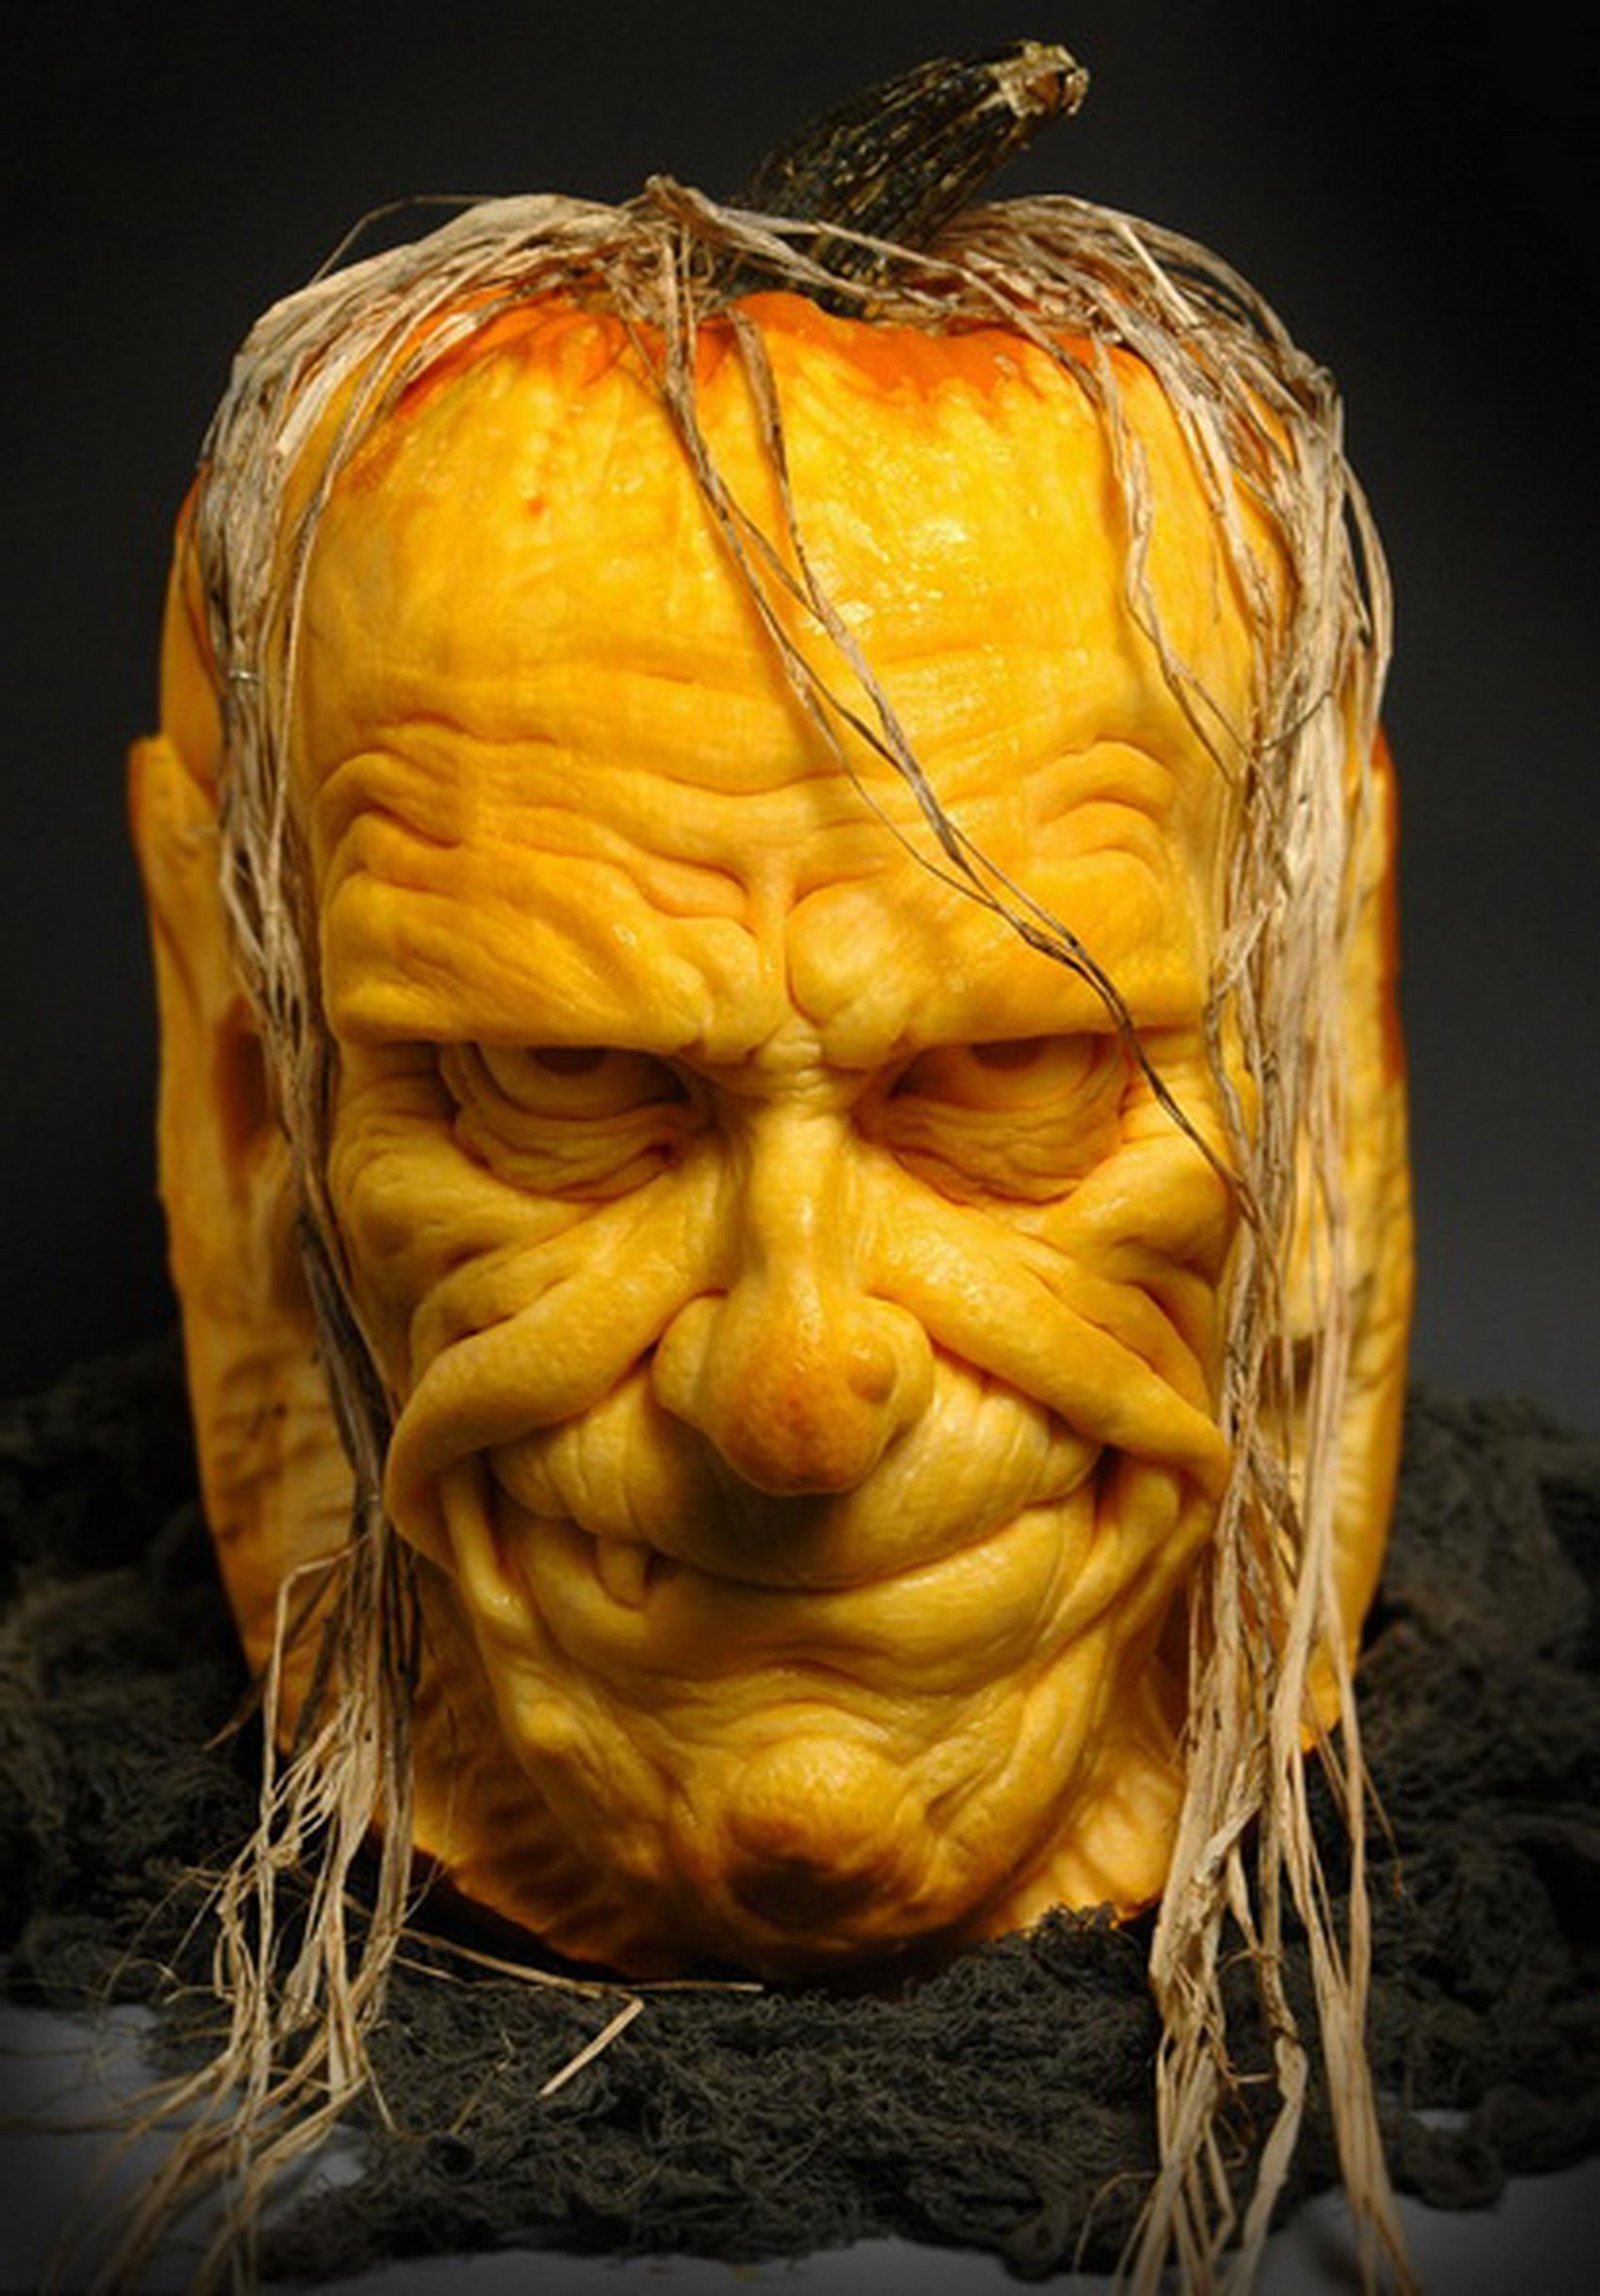 Free images wood statue produce pumpkin halloween yellow